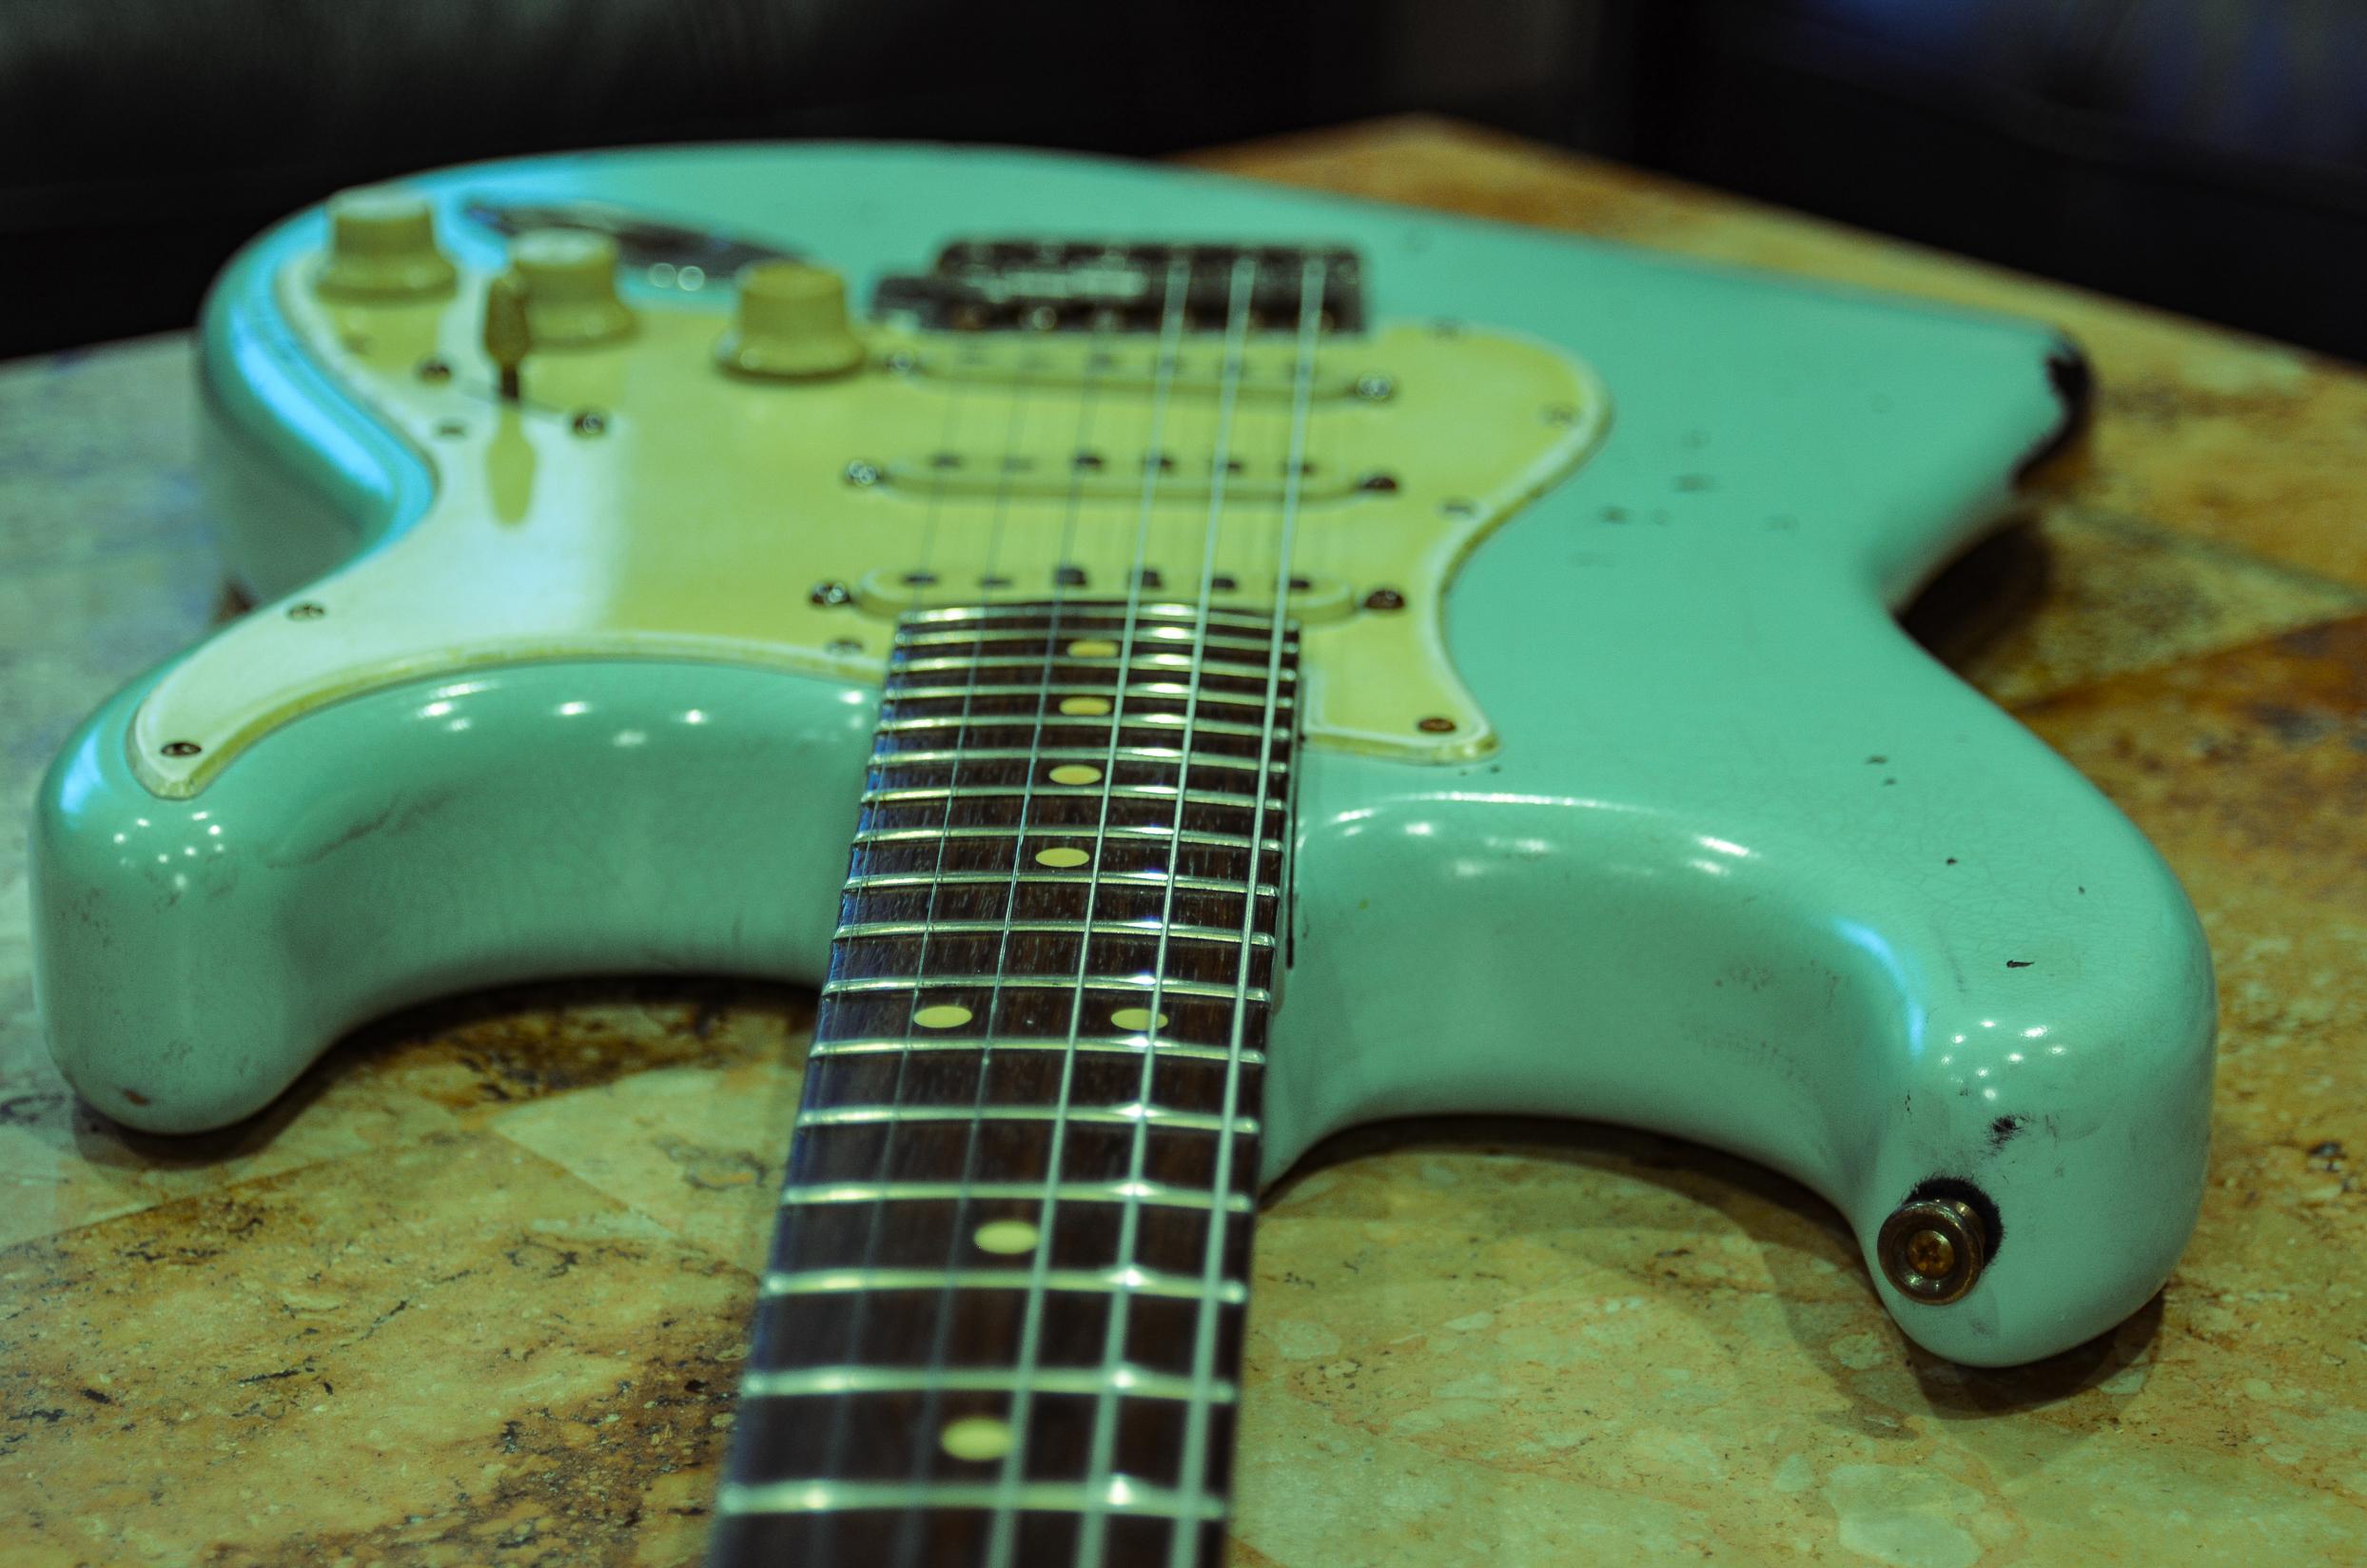 Fender Stratocaster Surf Green Relic Neck Guitarwacky.com